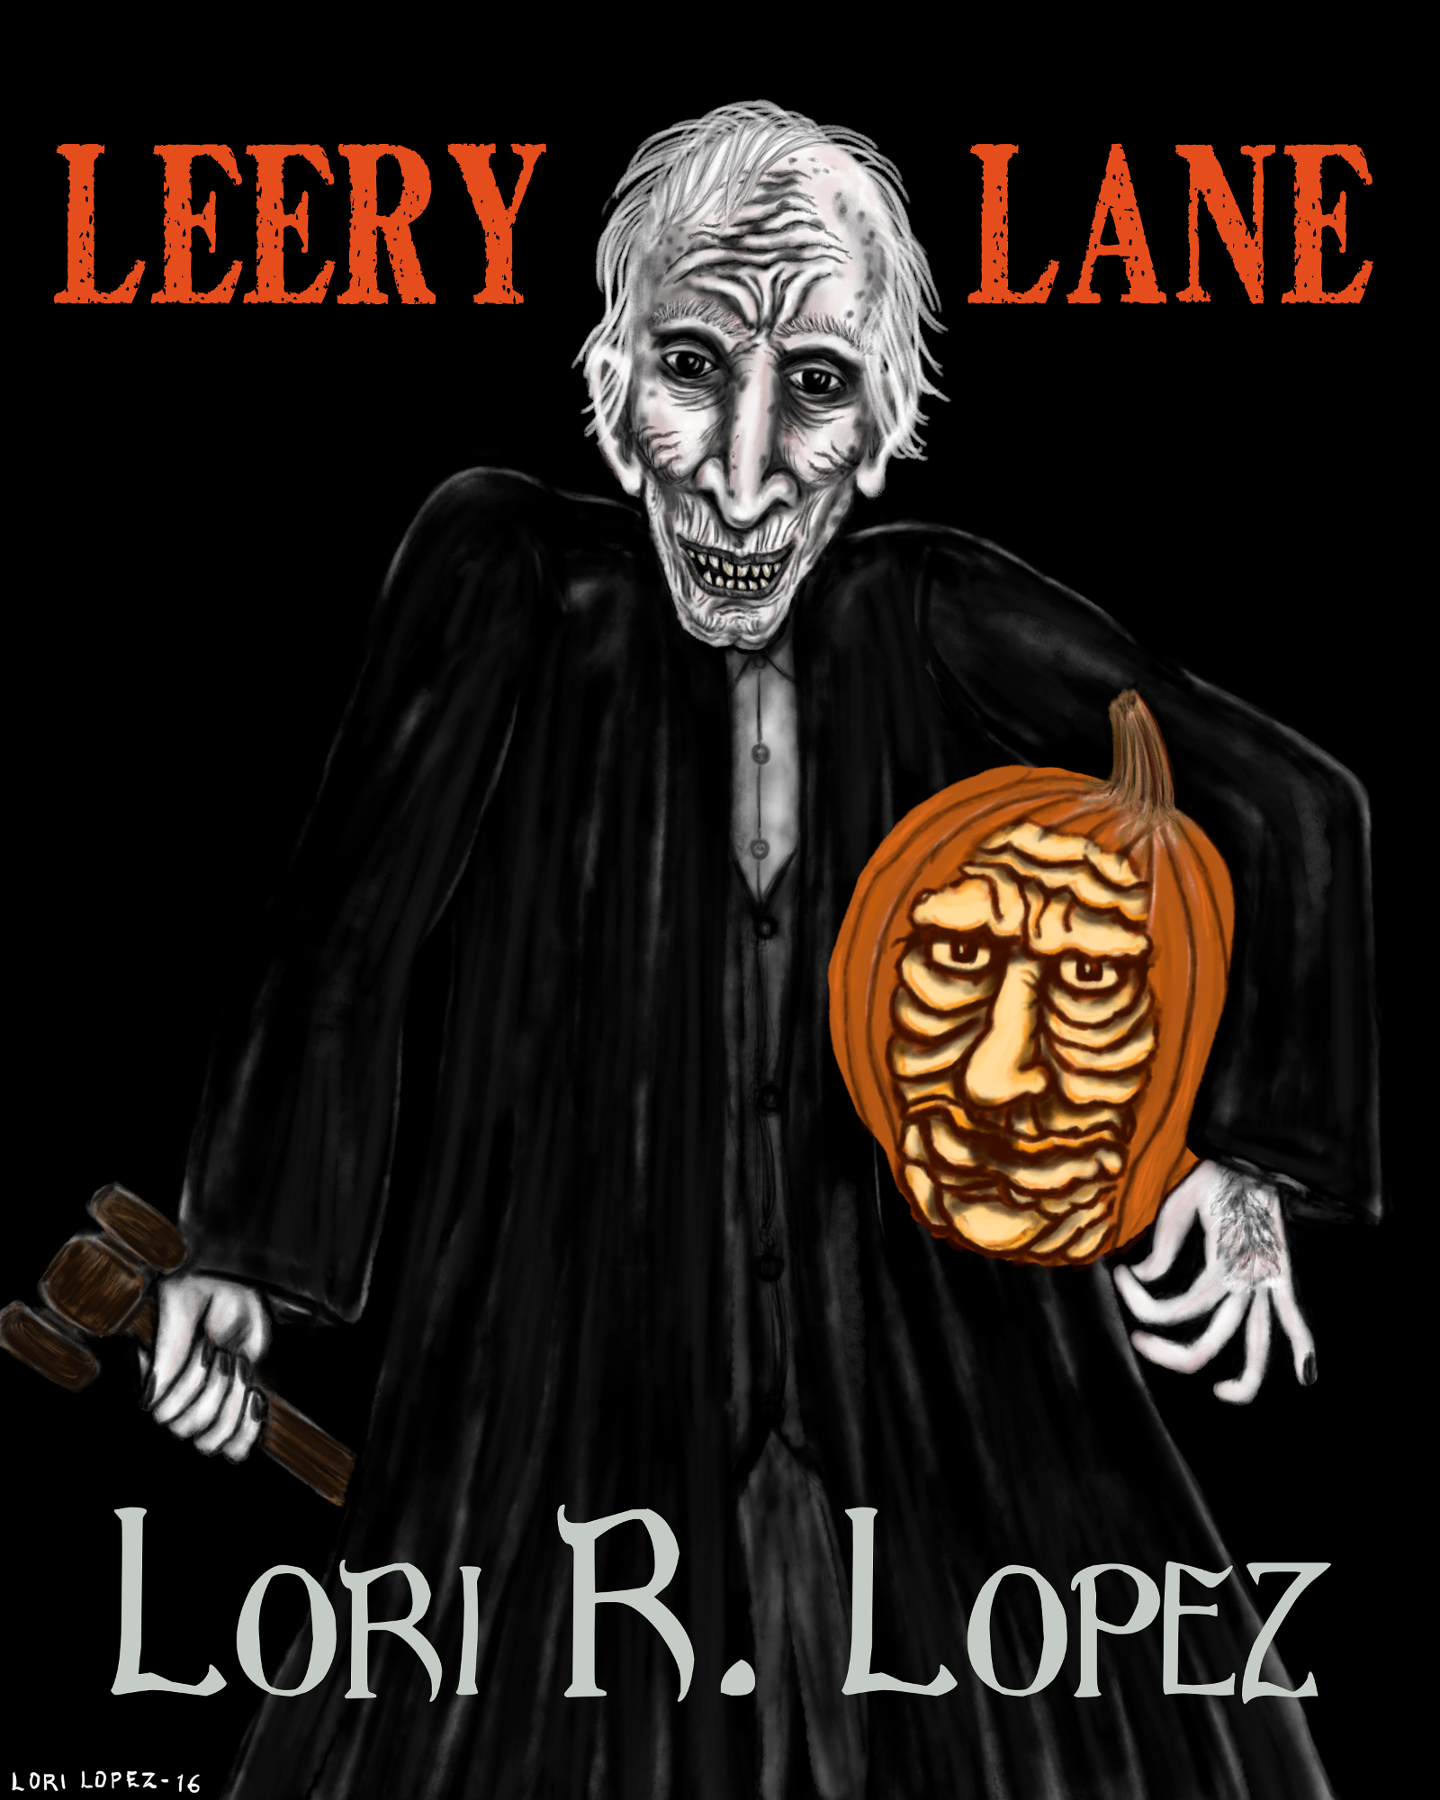 The Art of Lori R. Lopez 19